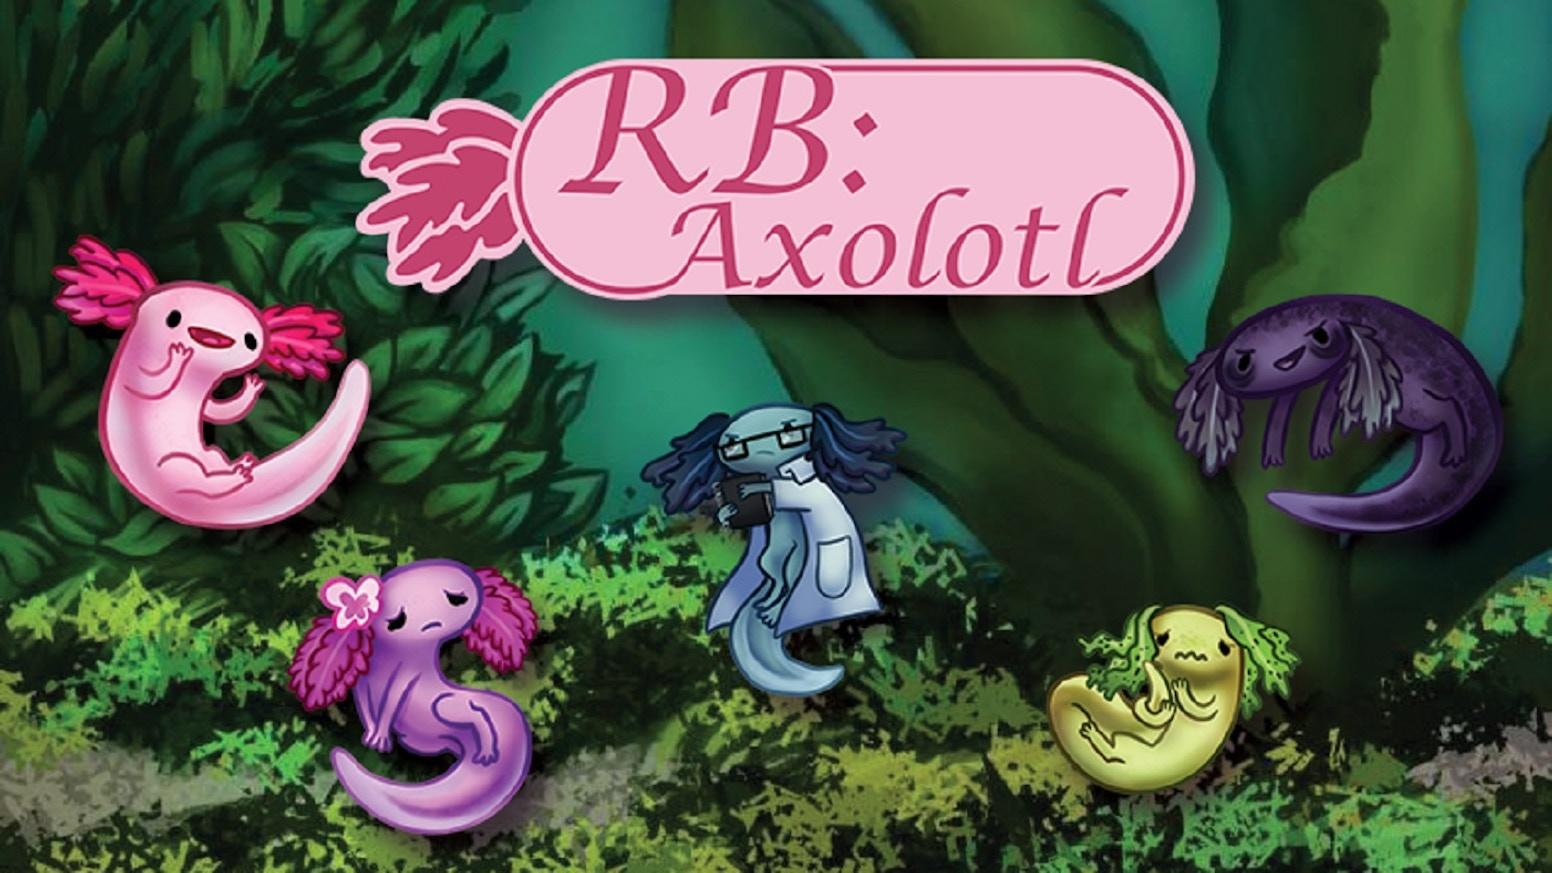 RB: Axolotl - A Dark Tale About Cute Axolotl Visual Novel by